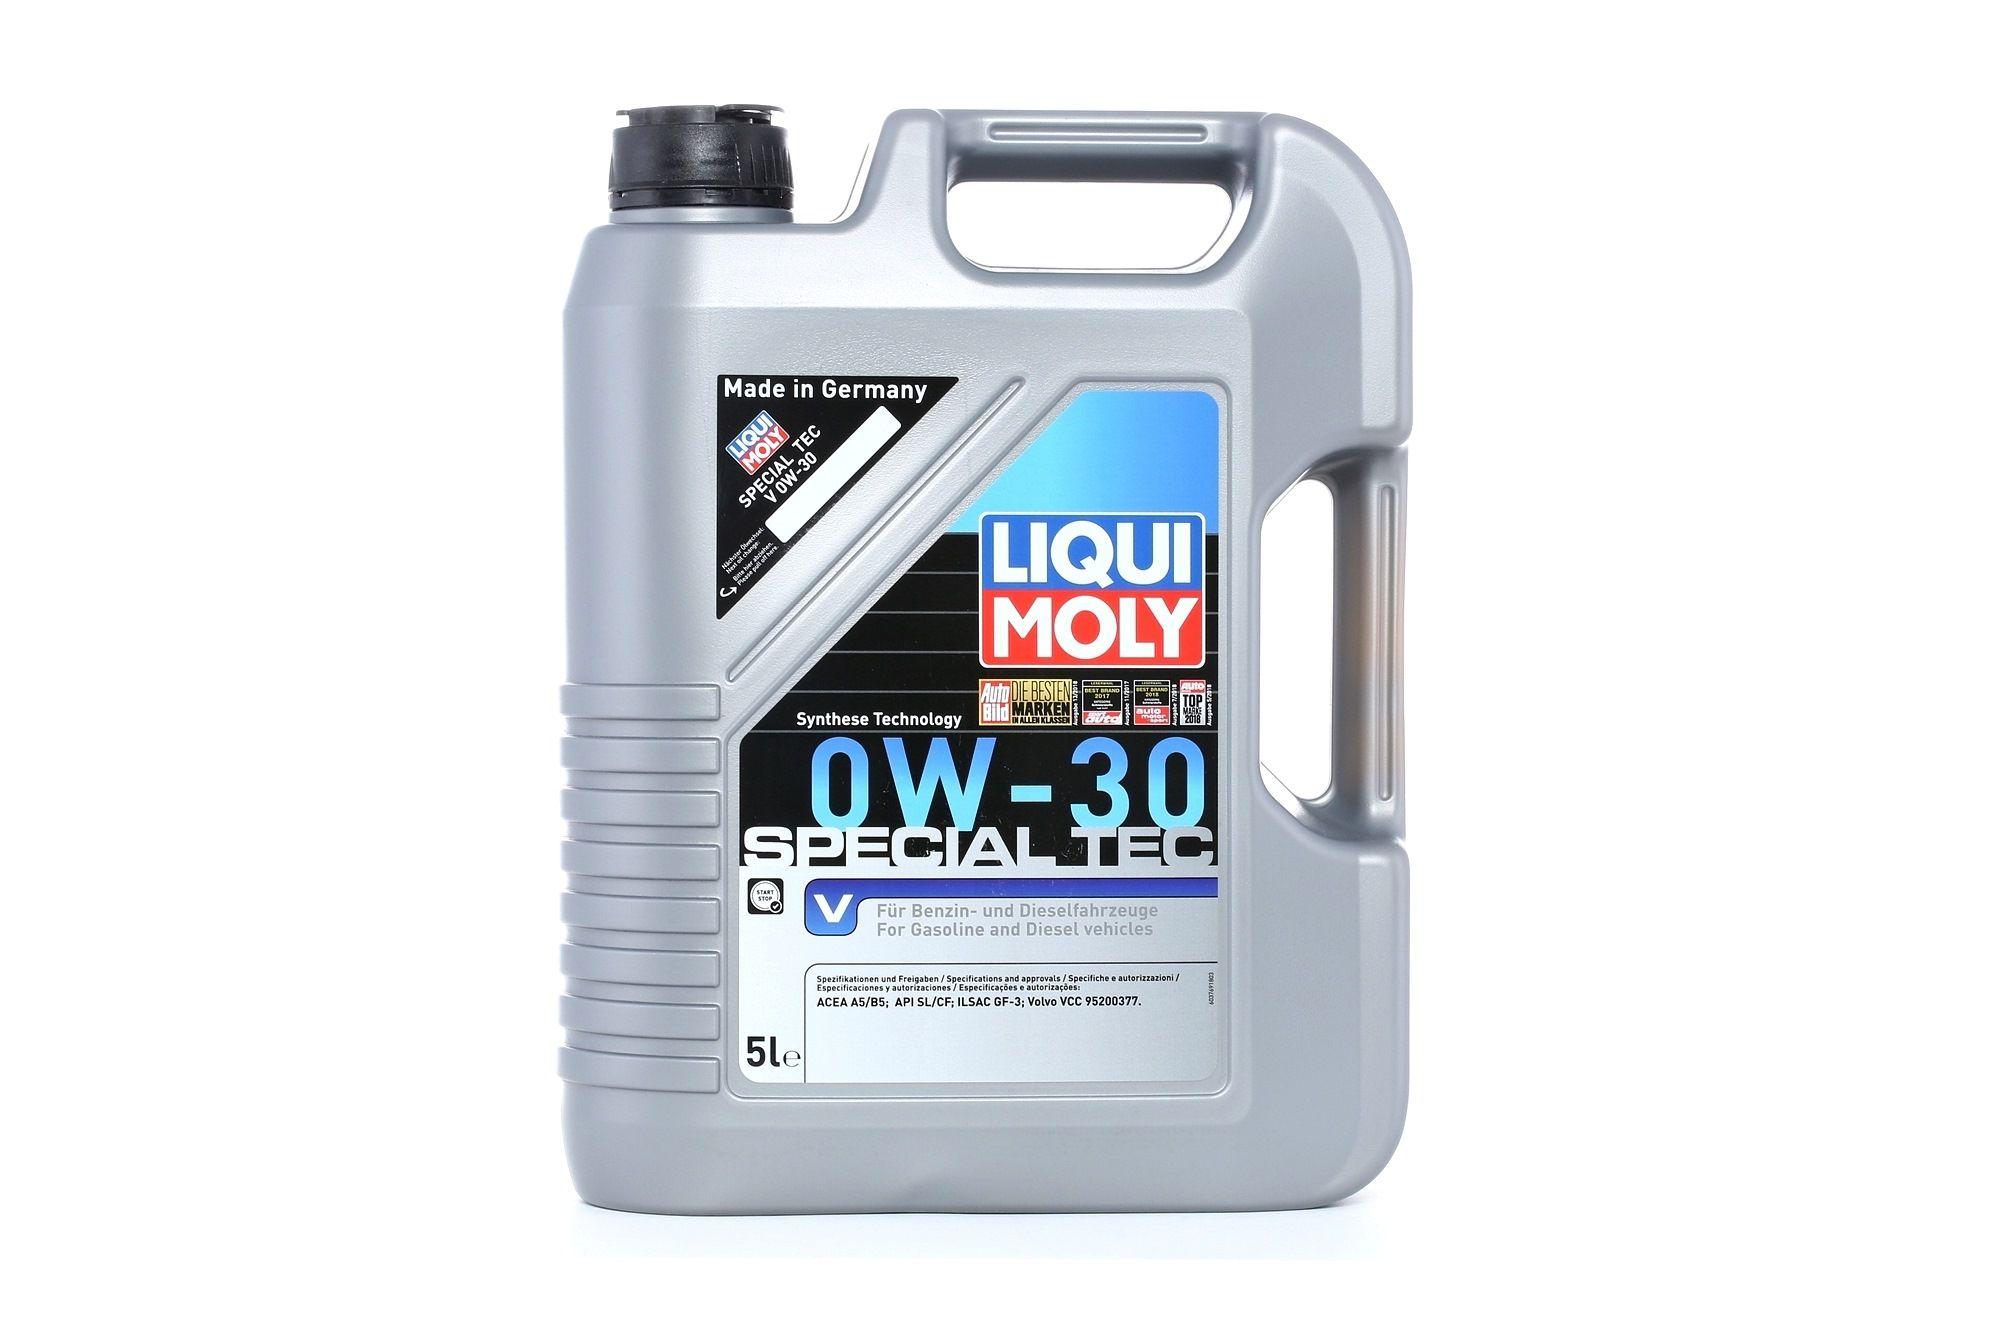 ol LIQUI MOLY VolvoVCC95200377 Bewertung